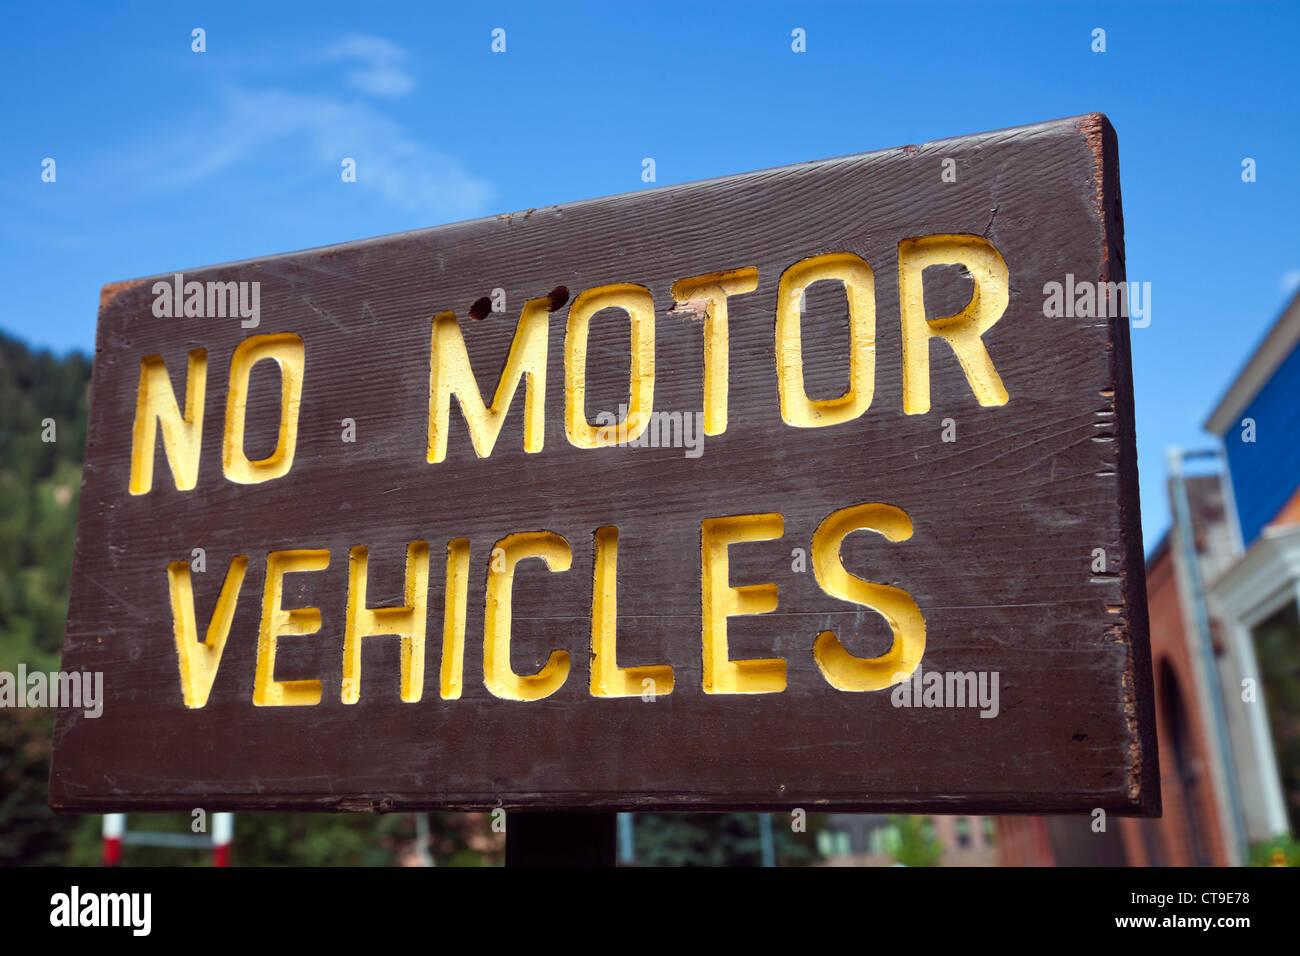 No motor vehicles - Stock Image